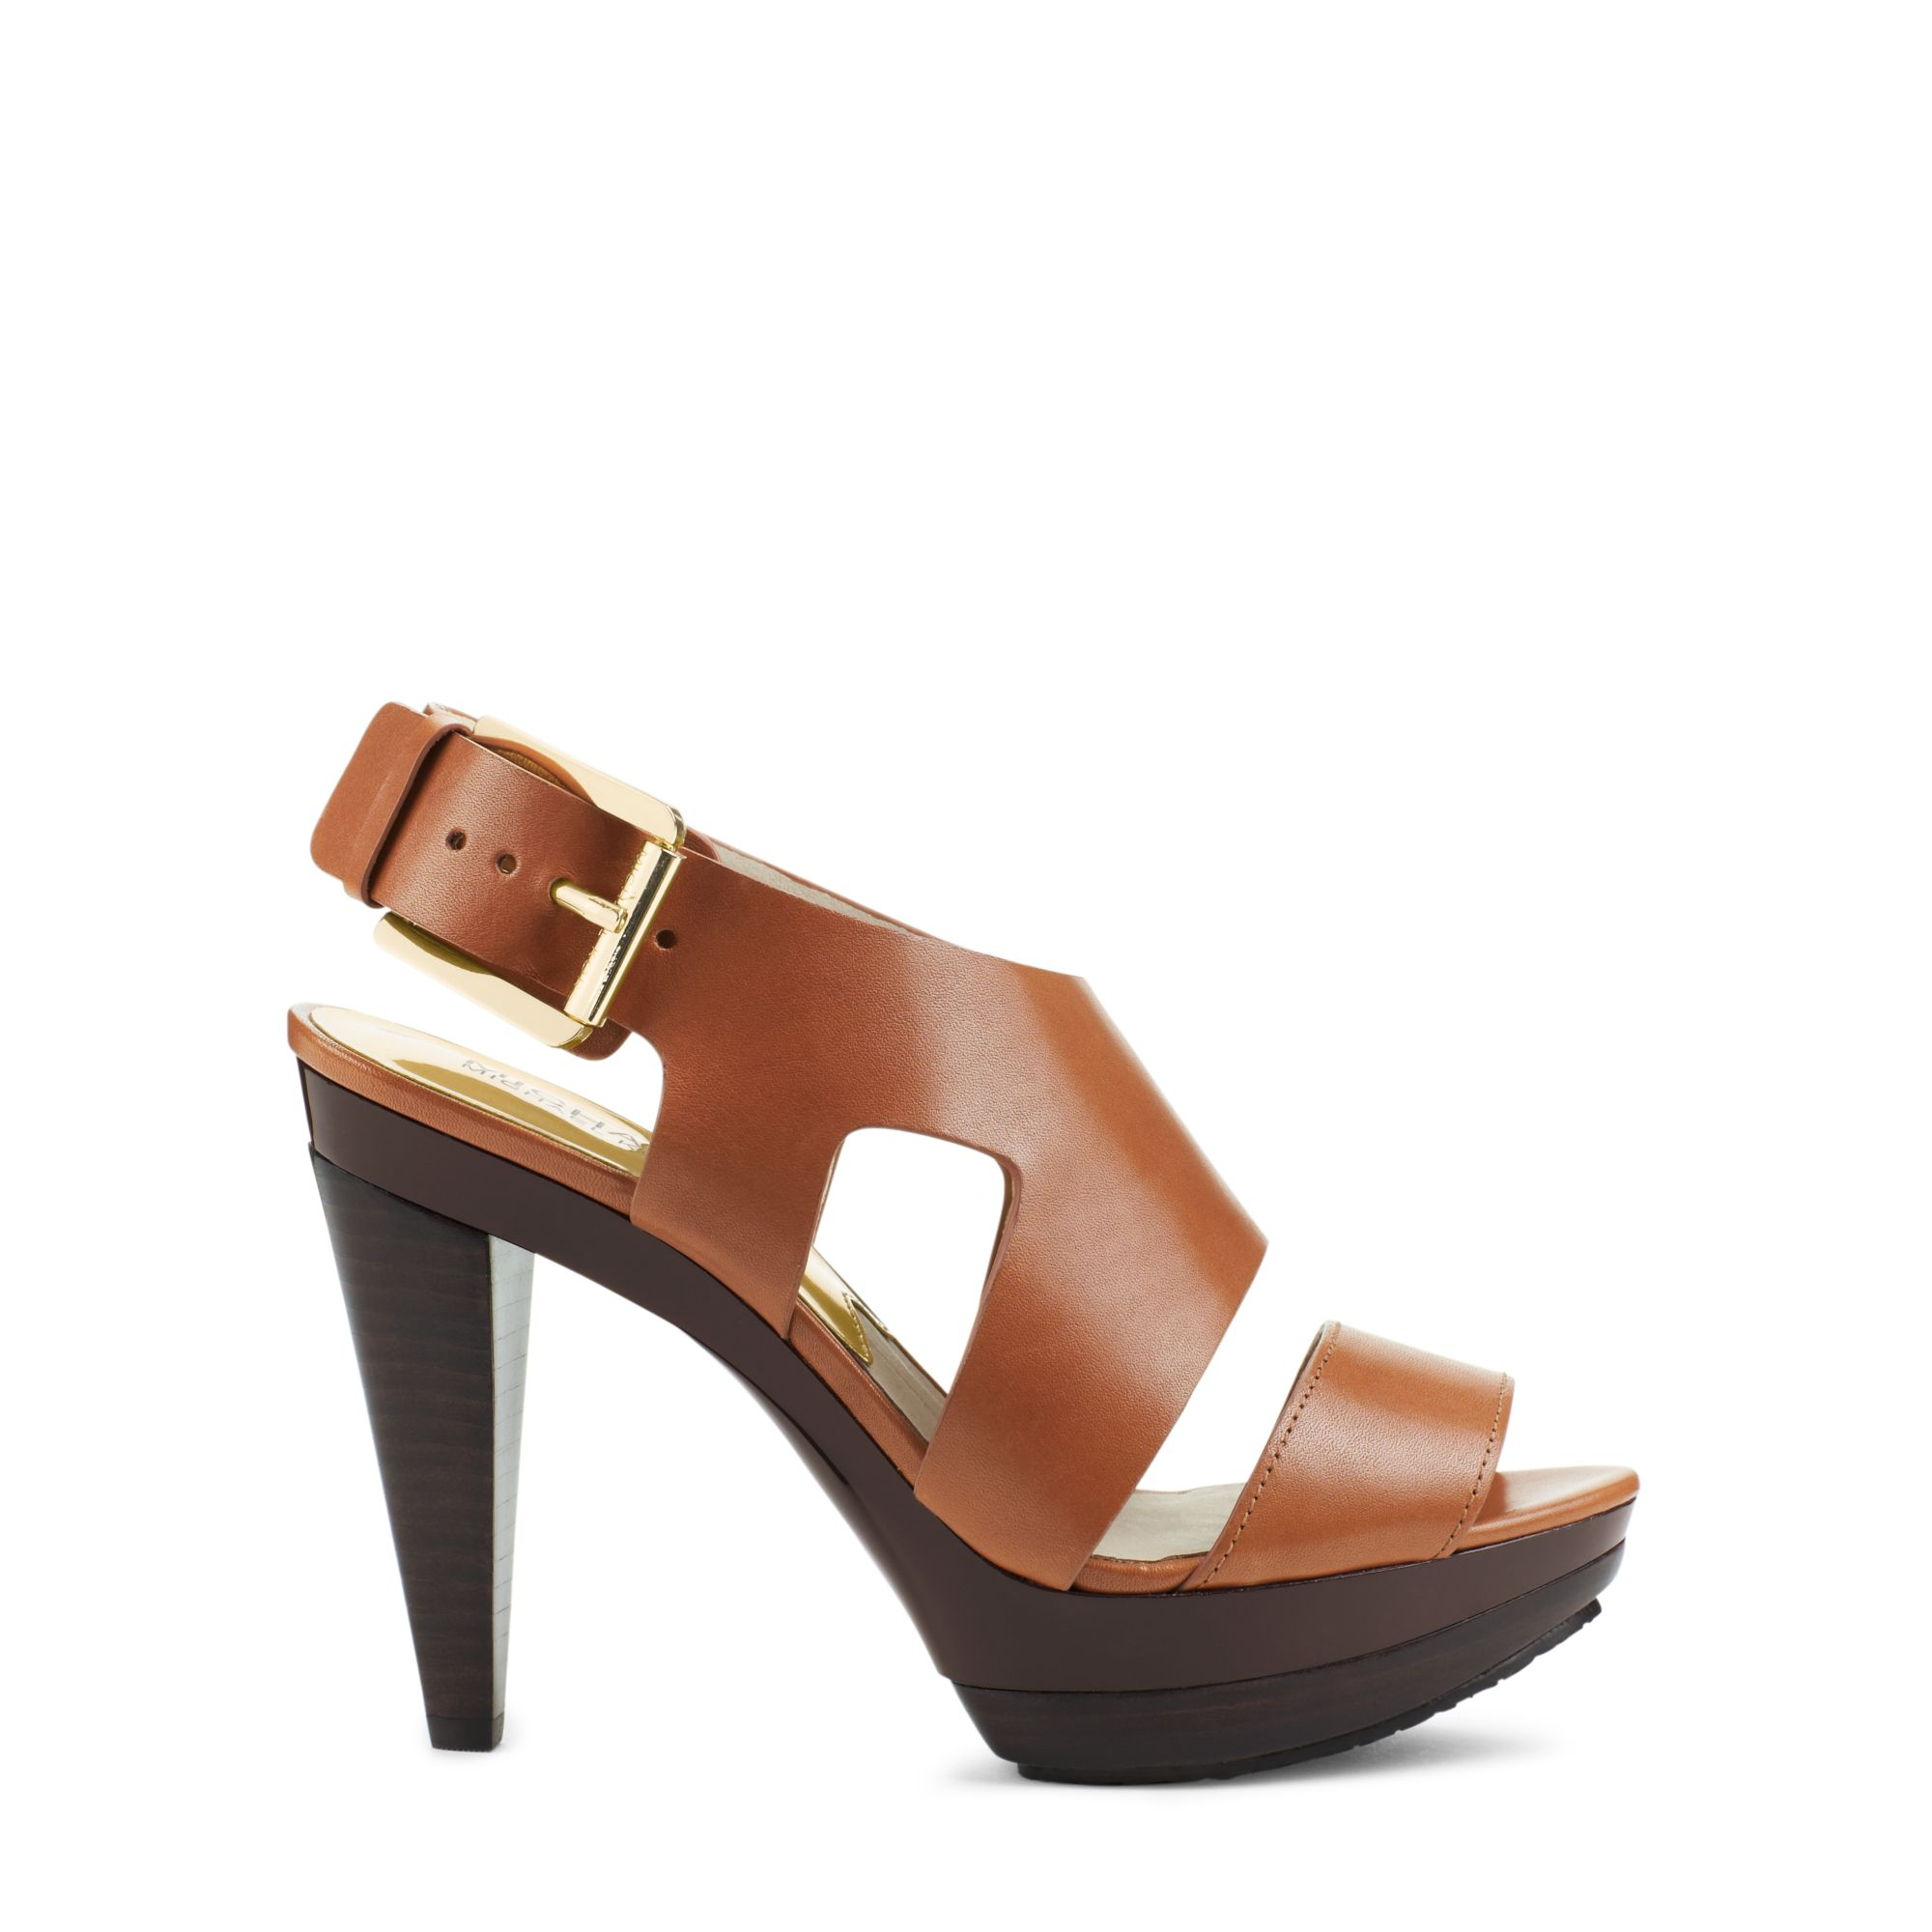 e421339dd258 Lyst - Michael Kors Carla Leather Platform Sandal in Brown